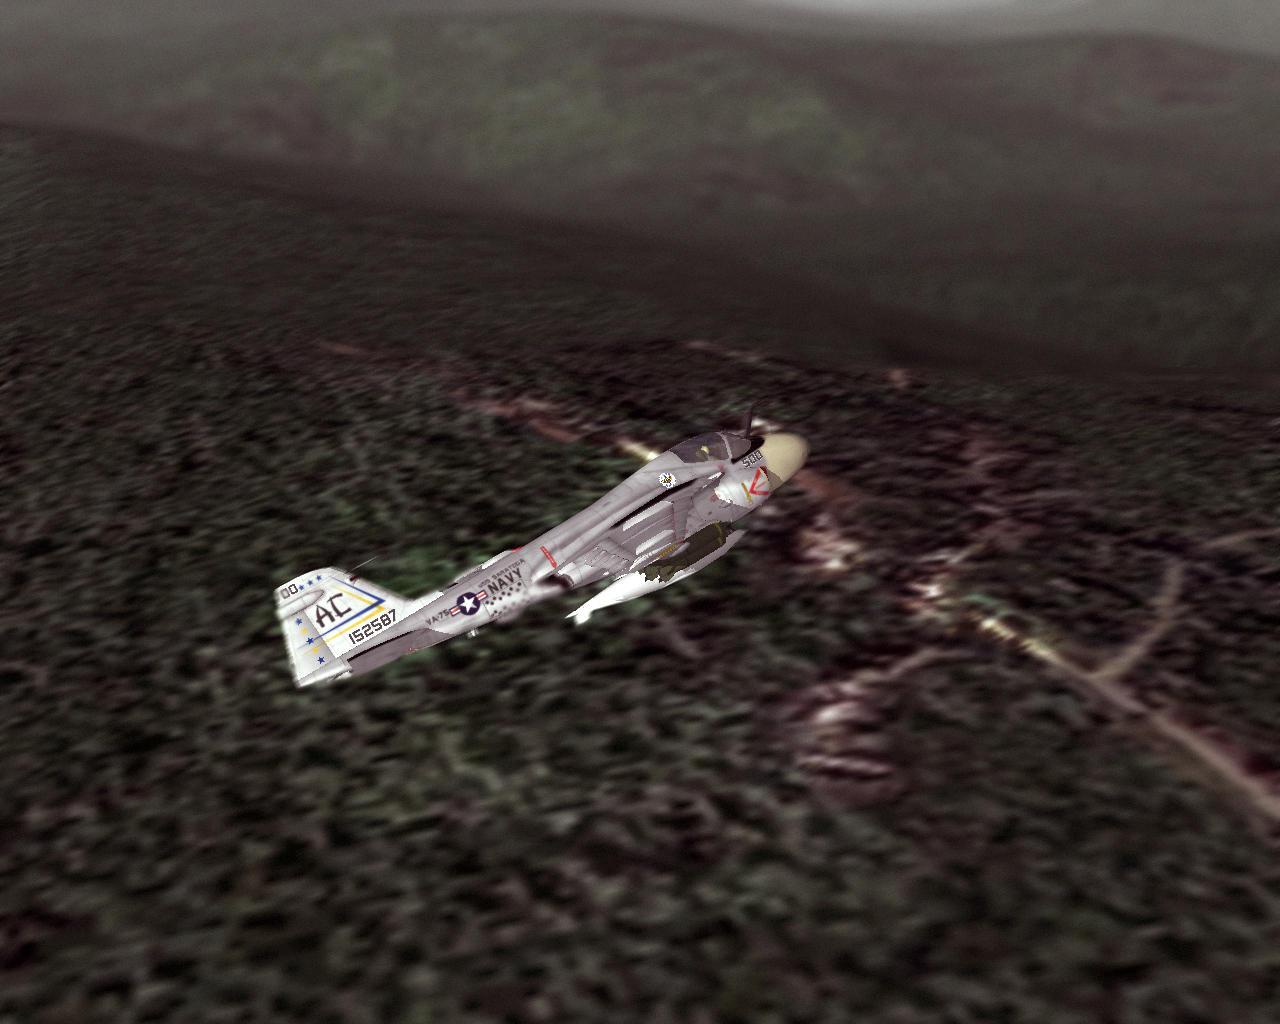 flight of the intruder ending a relationship